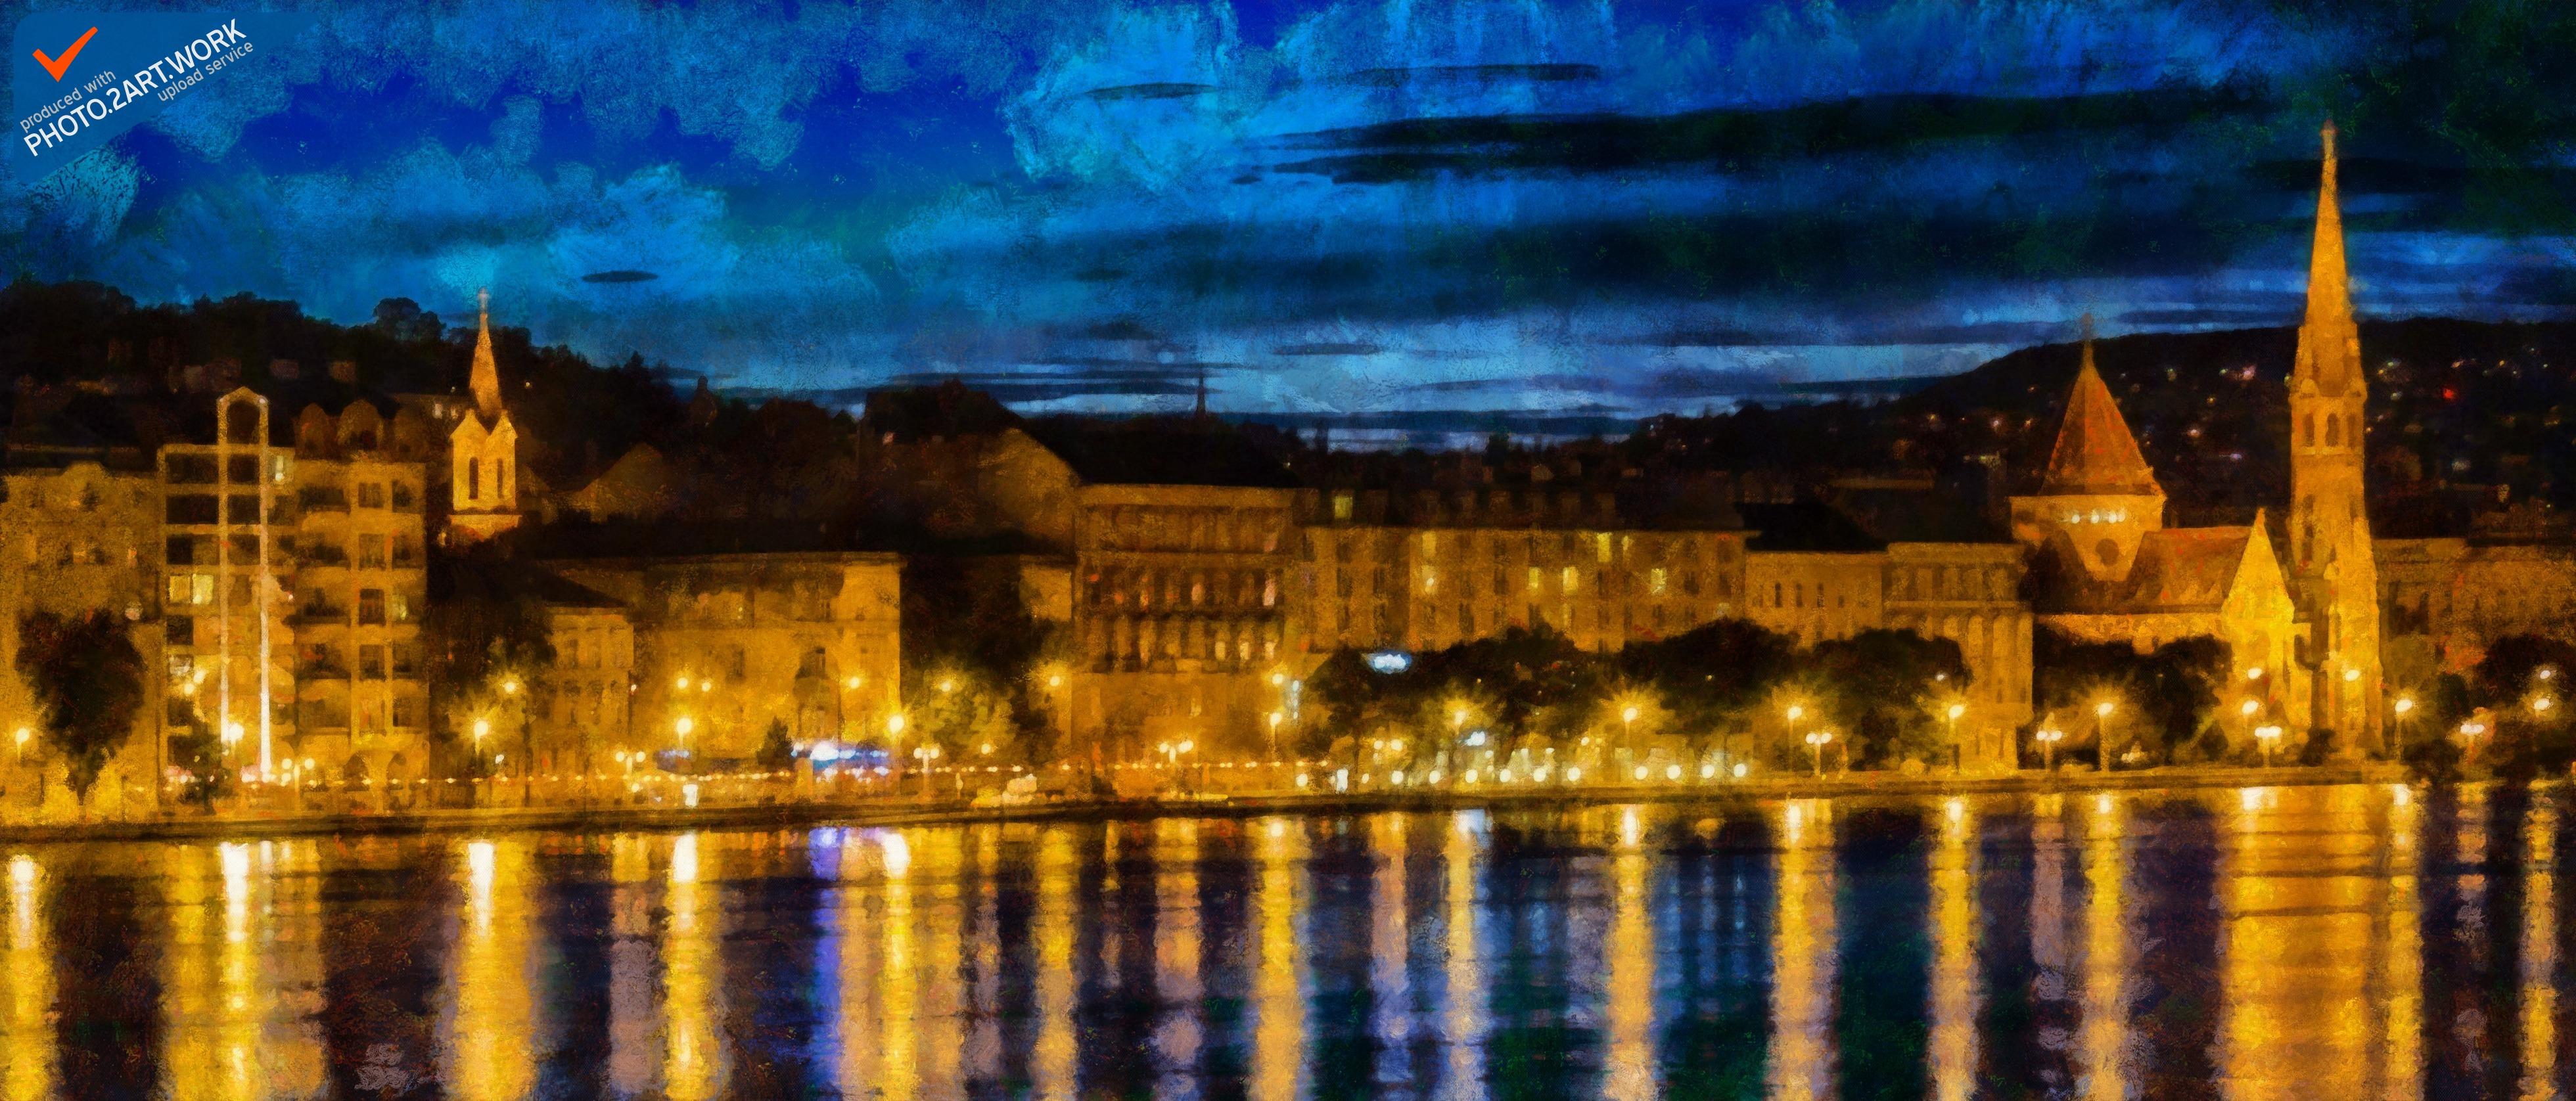 Budapest - id: 16236-104956-8529 photo